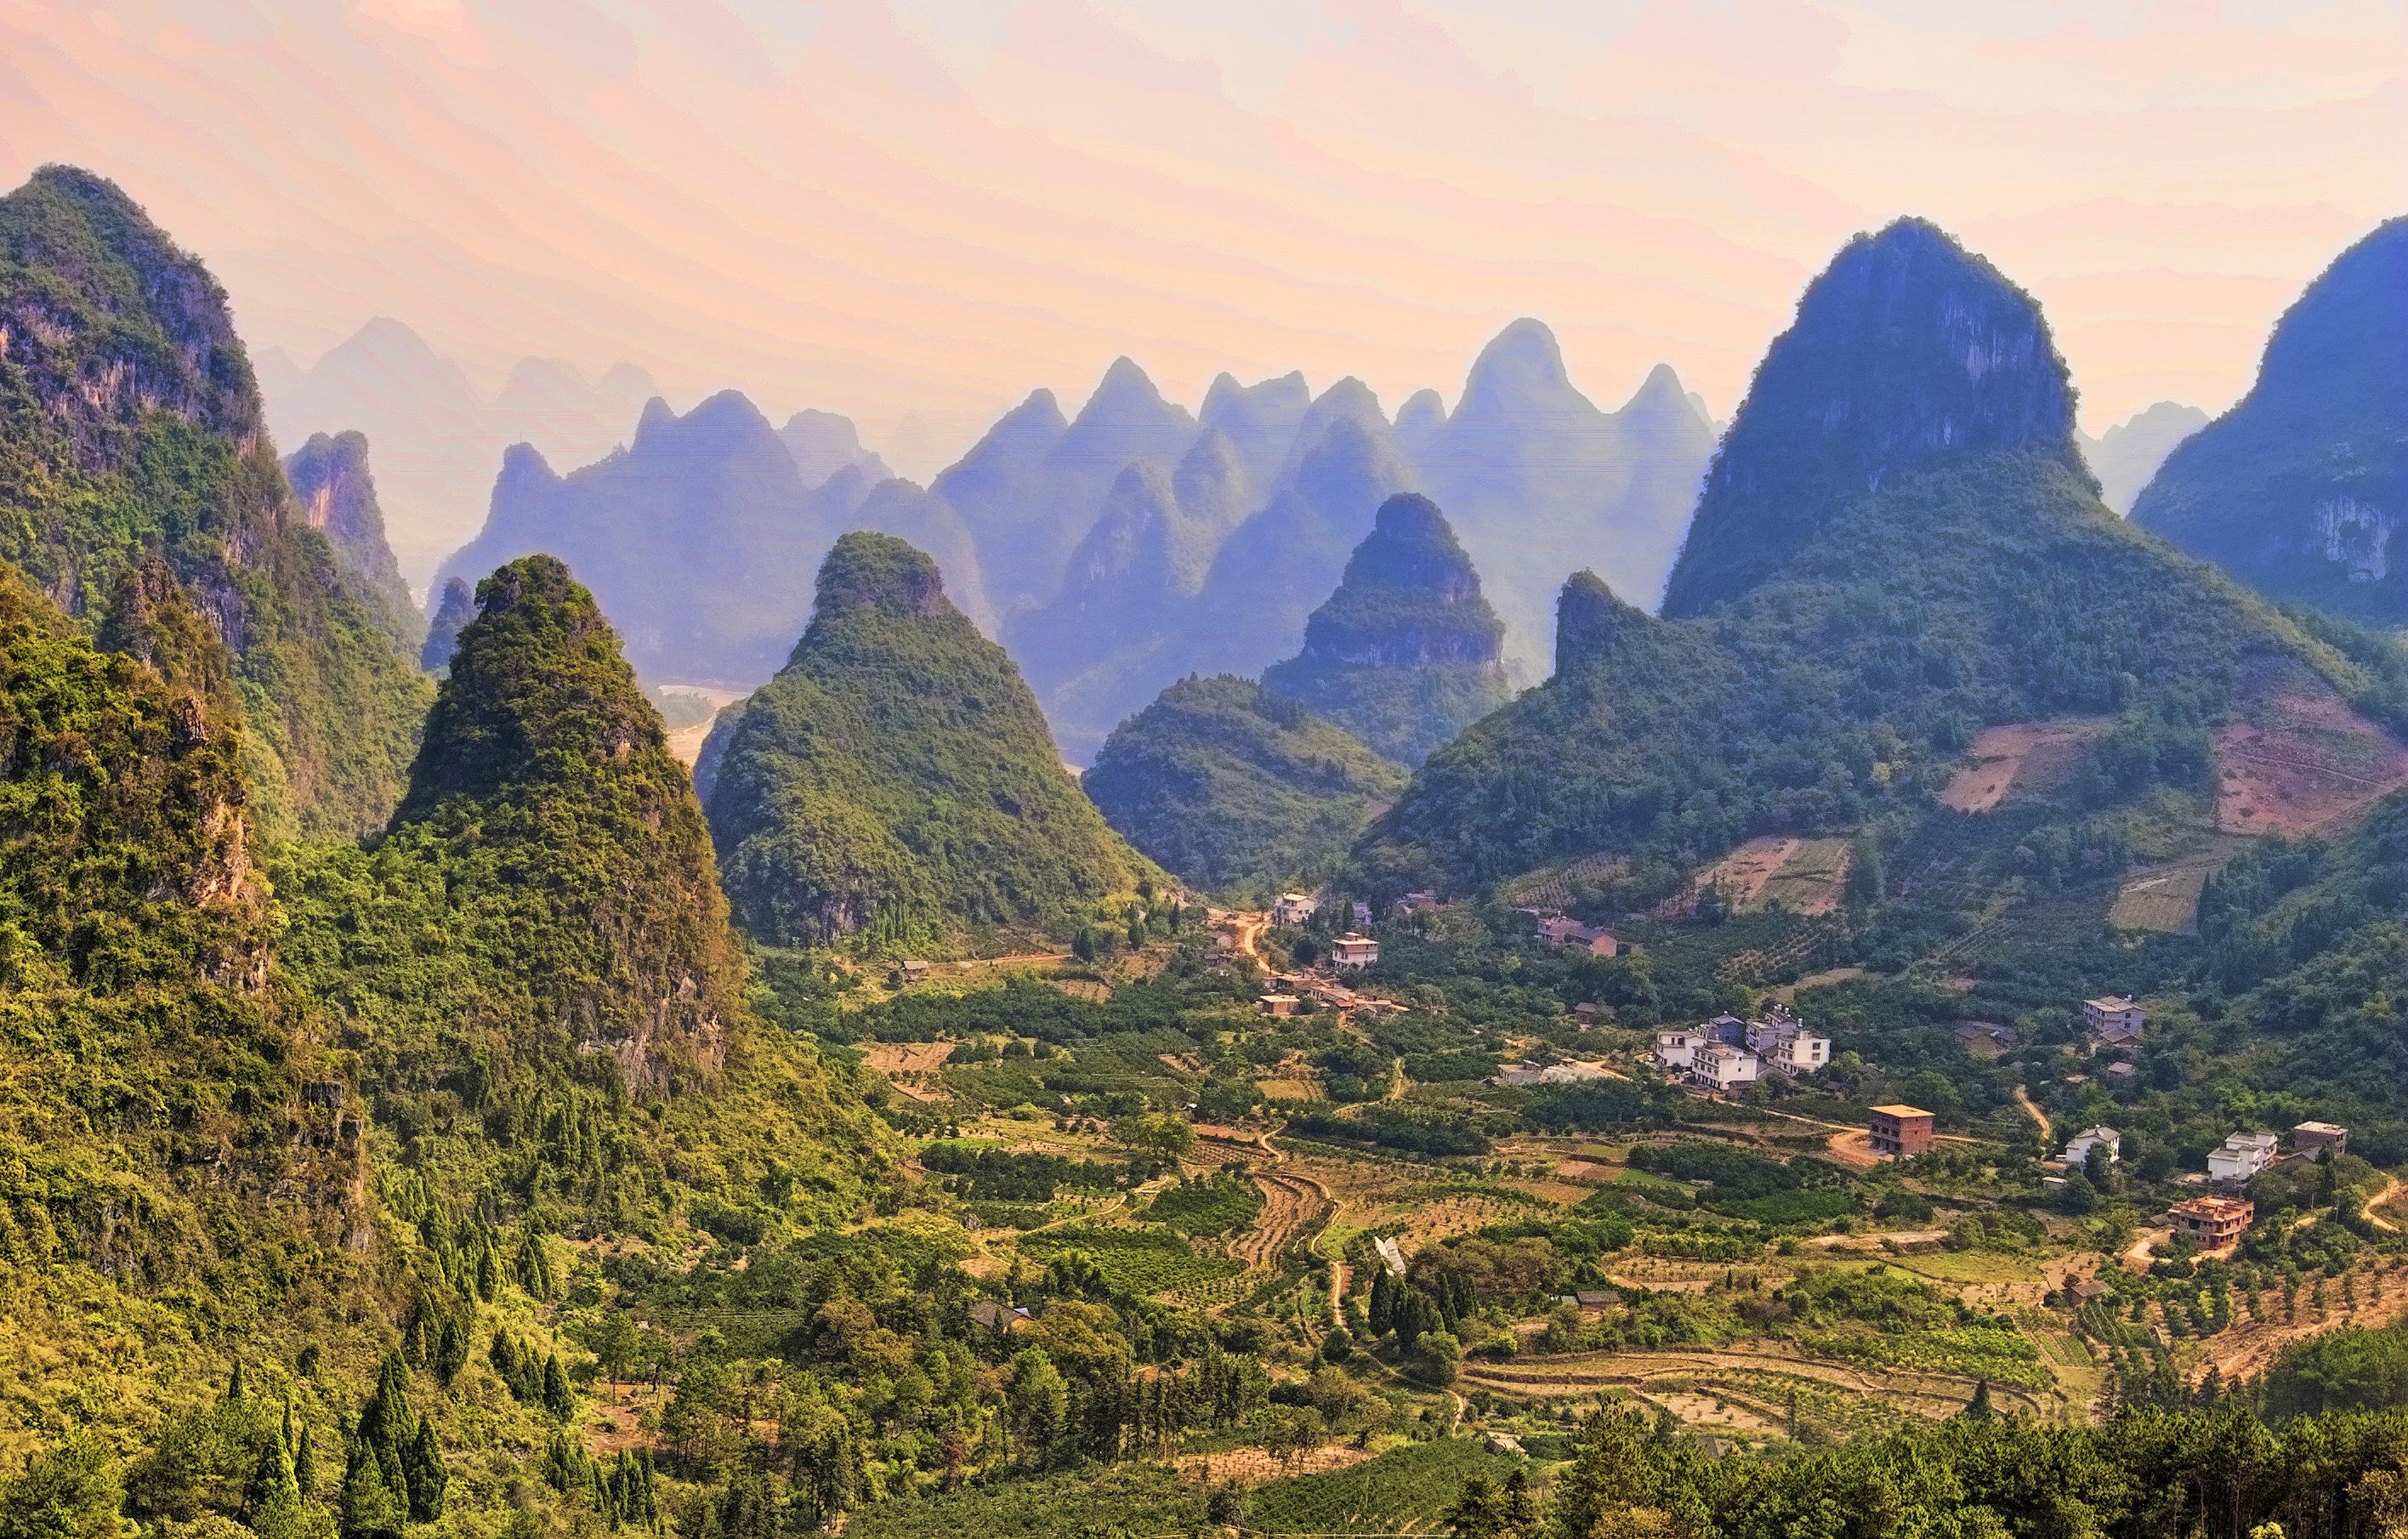 Montanhas cársticas de Yangshuo, pronvíncia de Guangxi, China